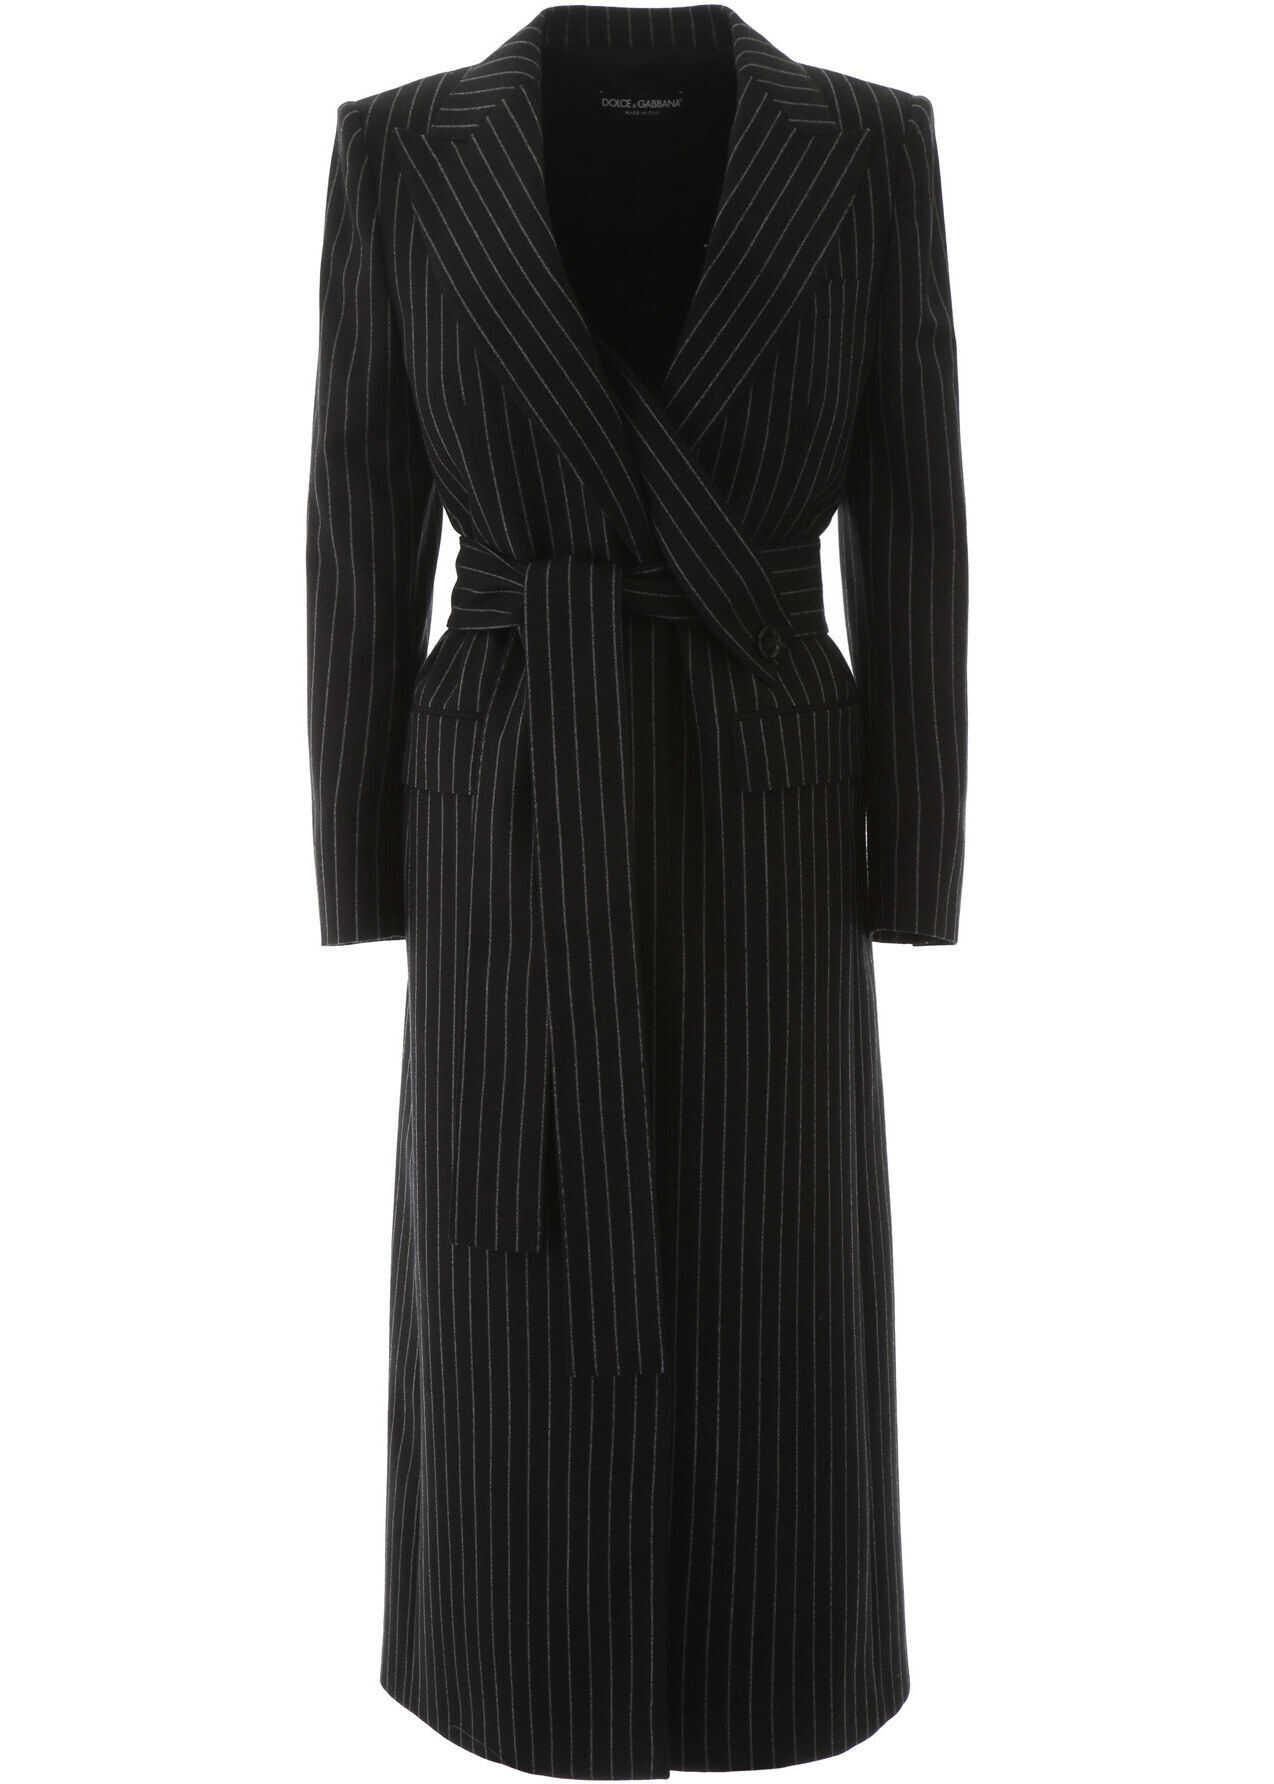 Dolce & Gabbana Pinstripe Wool Coat RIGATO